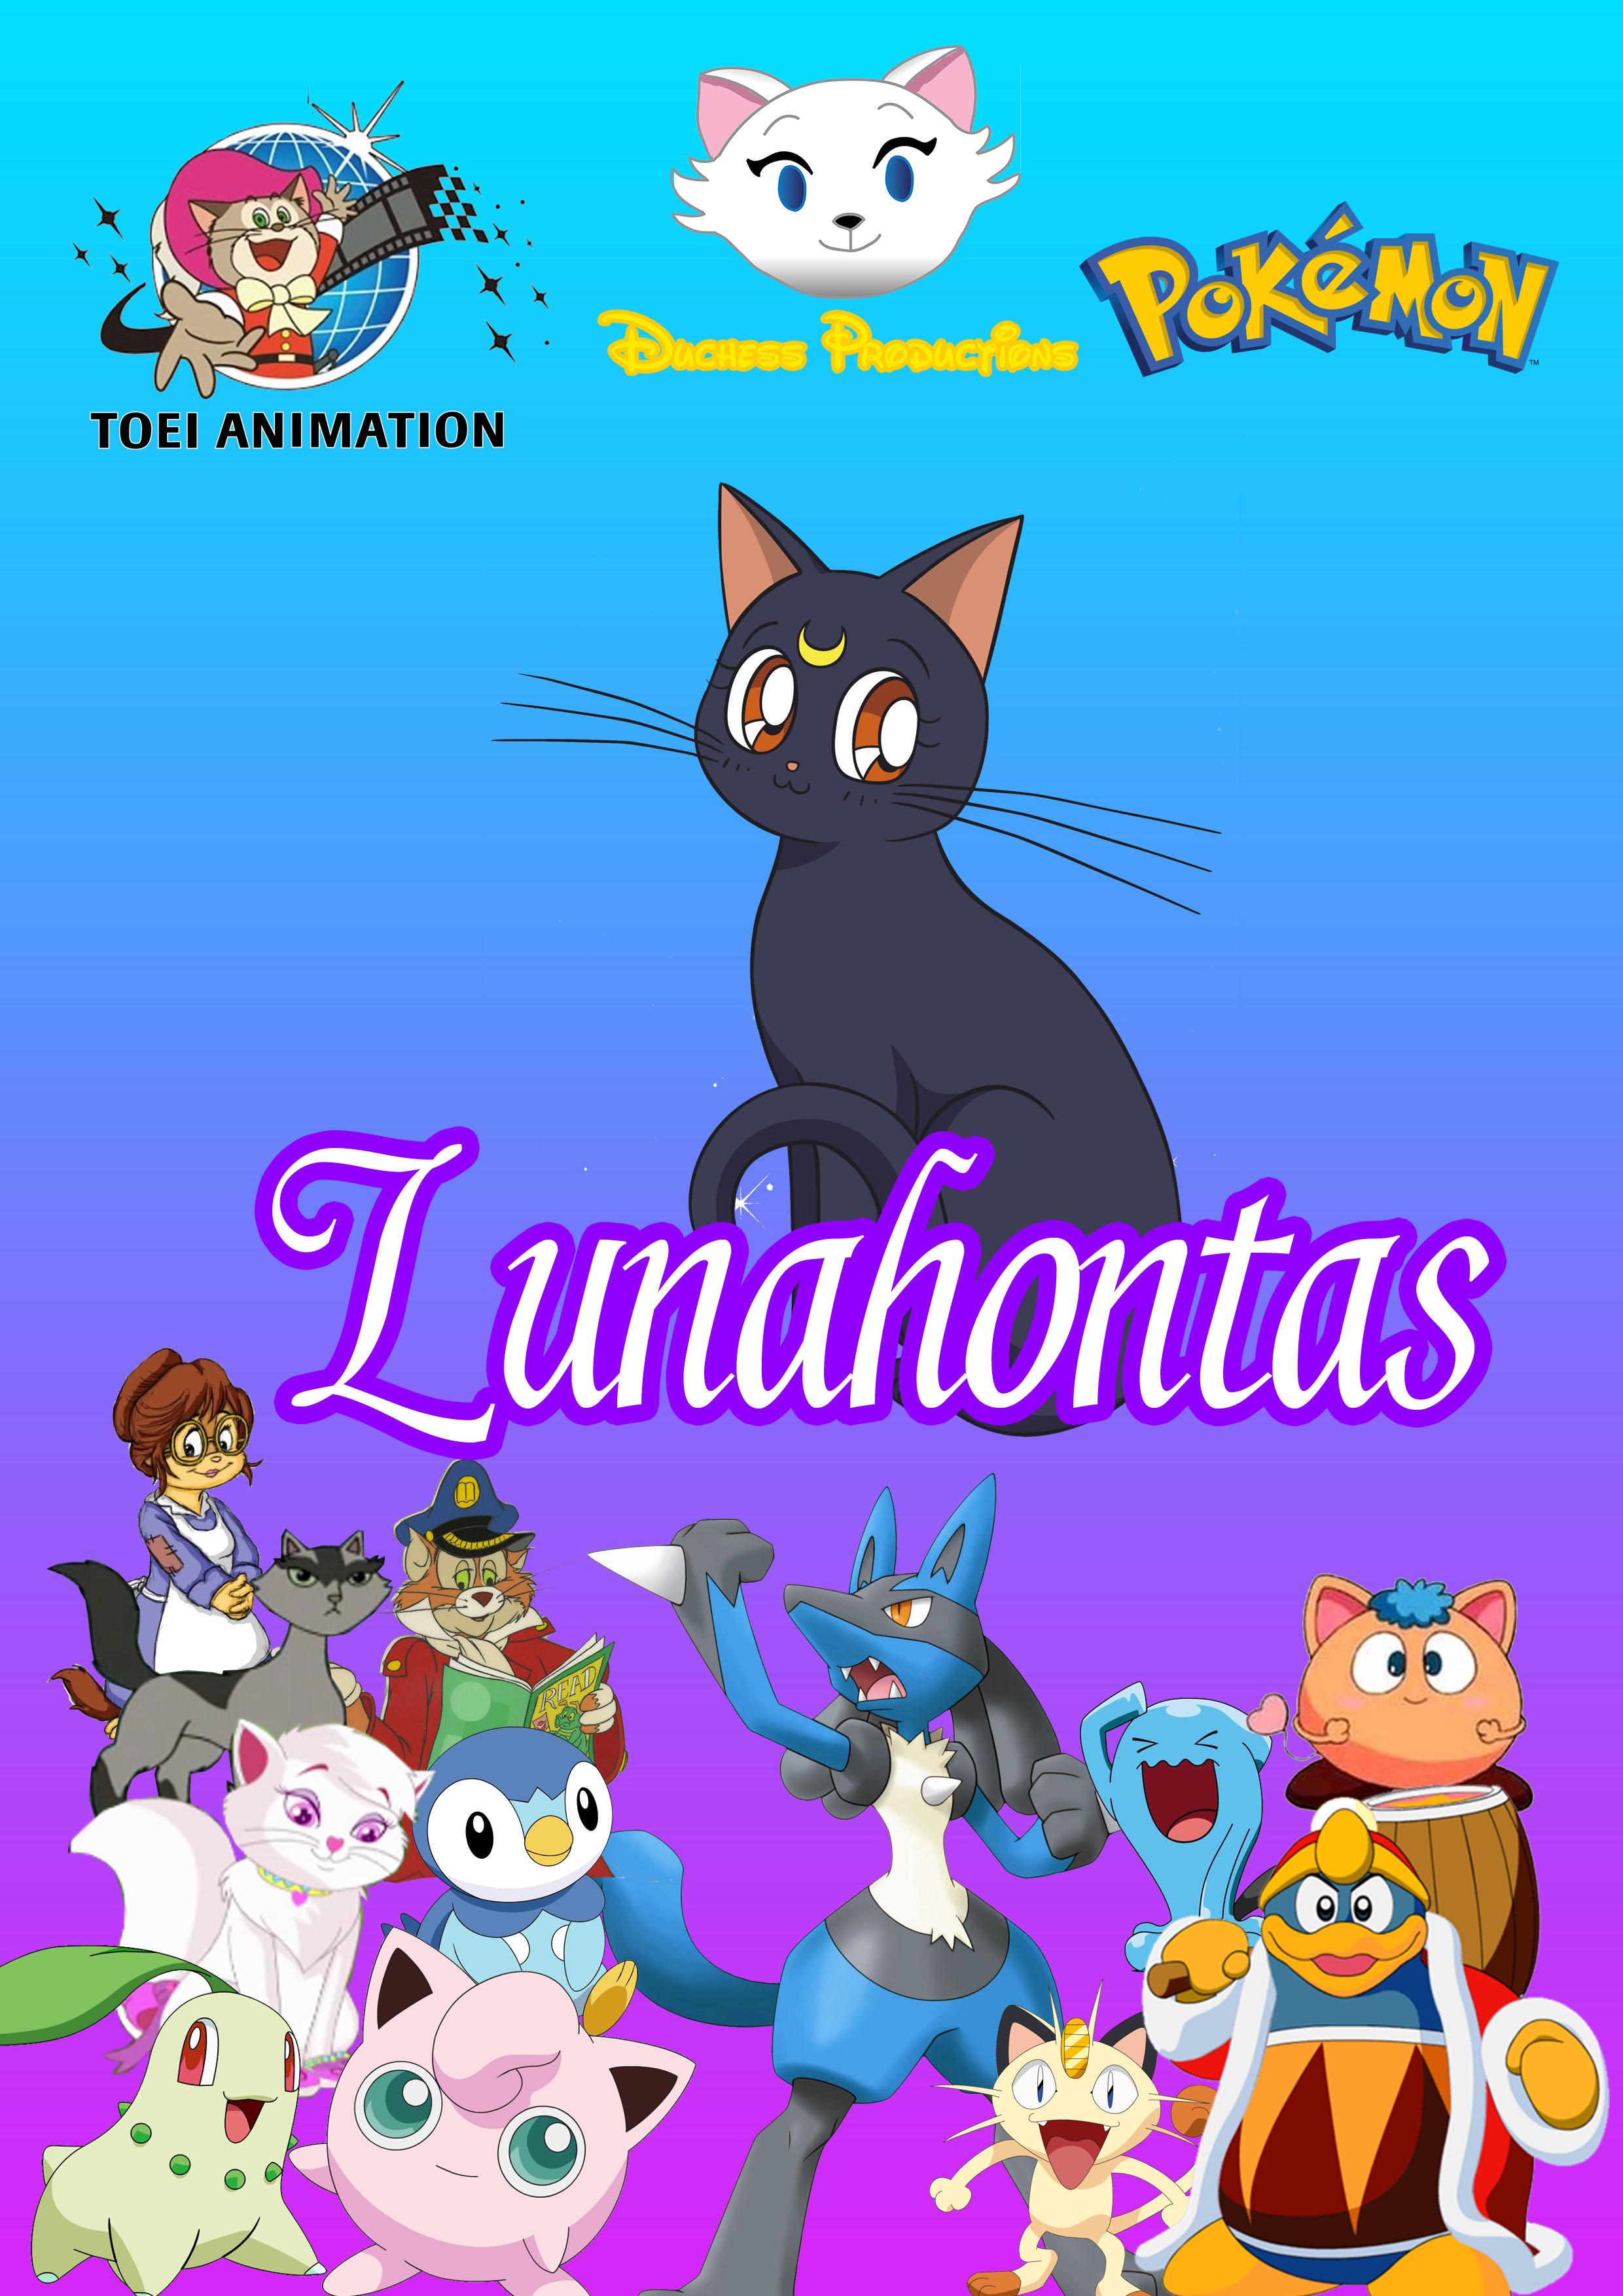 Lunahontas (Duchess Productions Style)